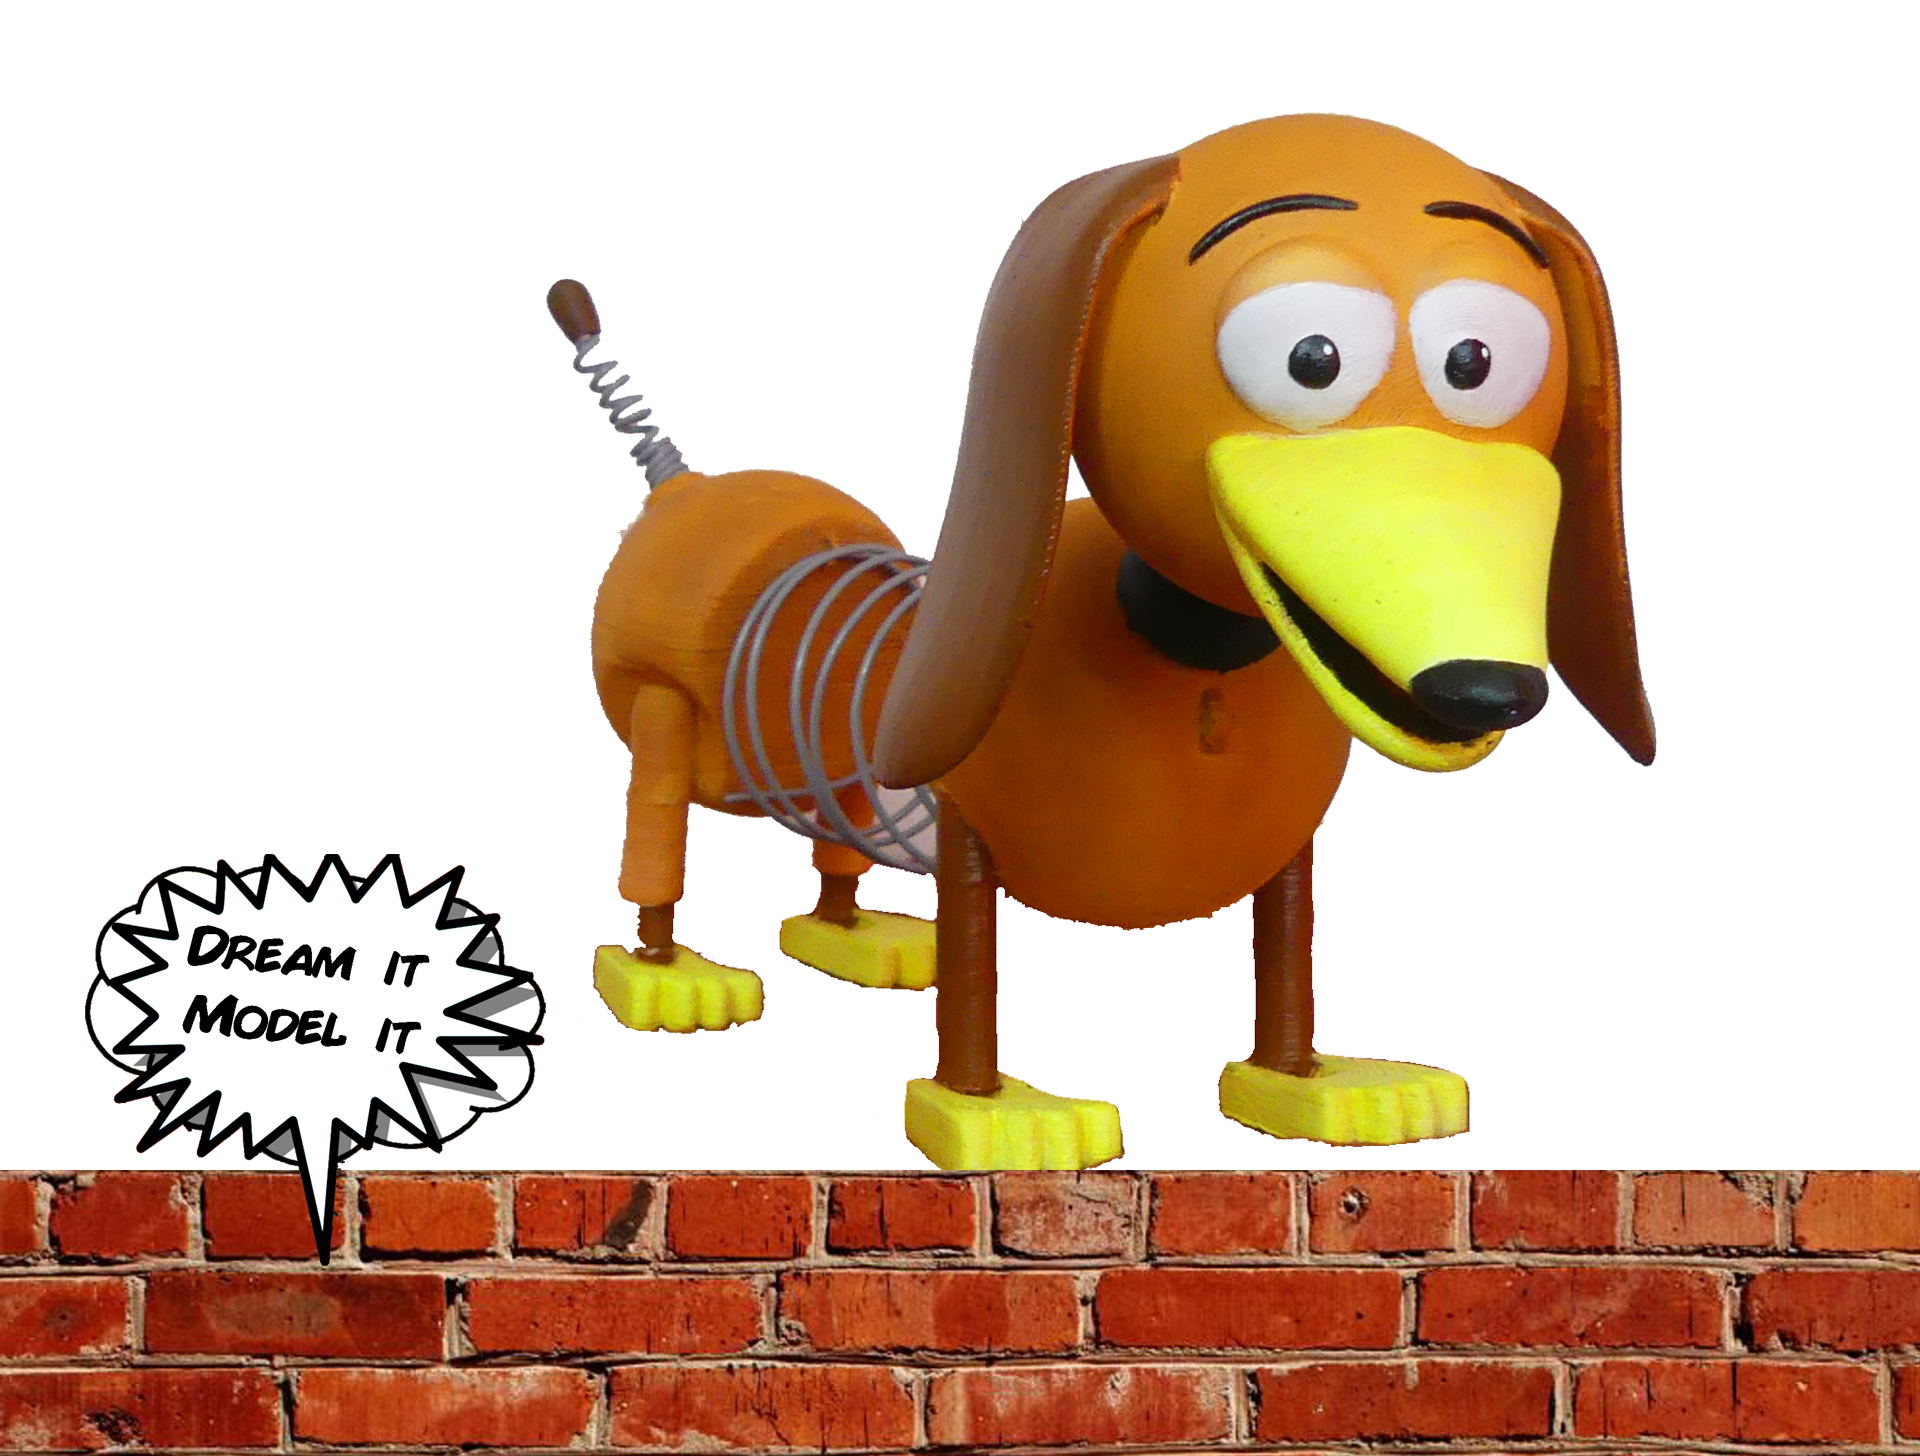 slinky.png Download free STL file Slinky [Toy Story] • 3D printable model, Dream_it_Model_it